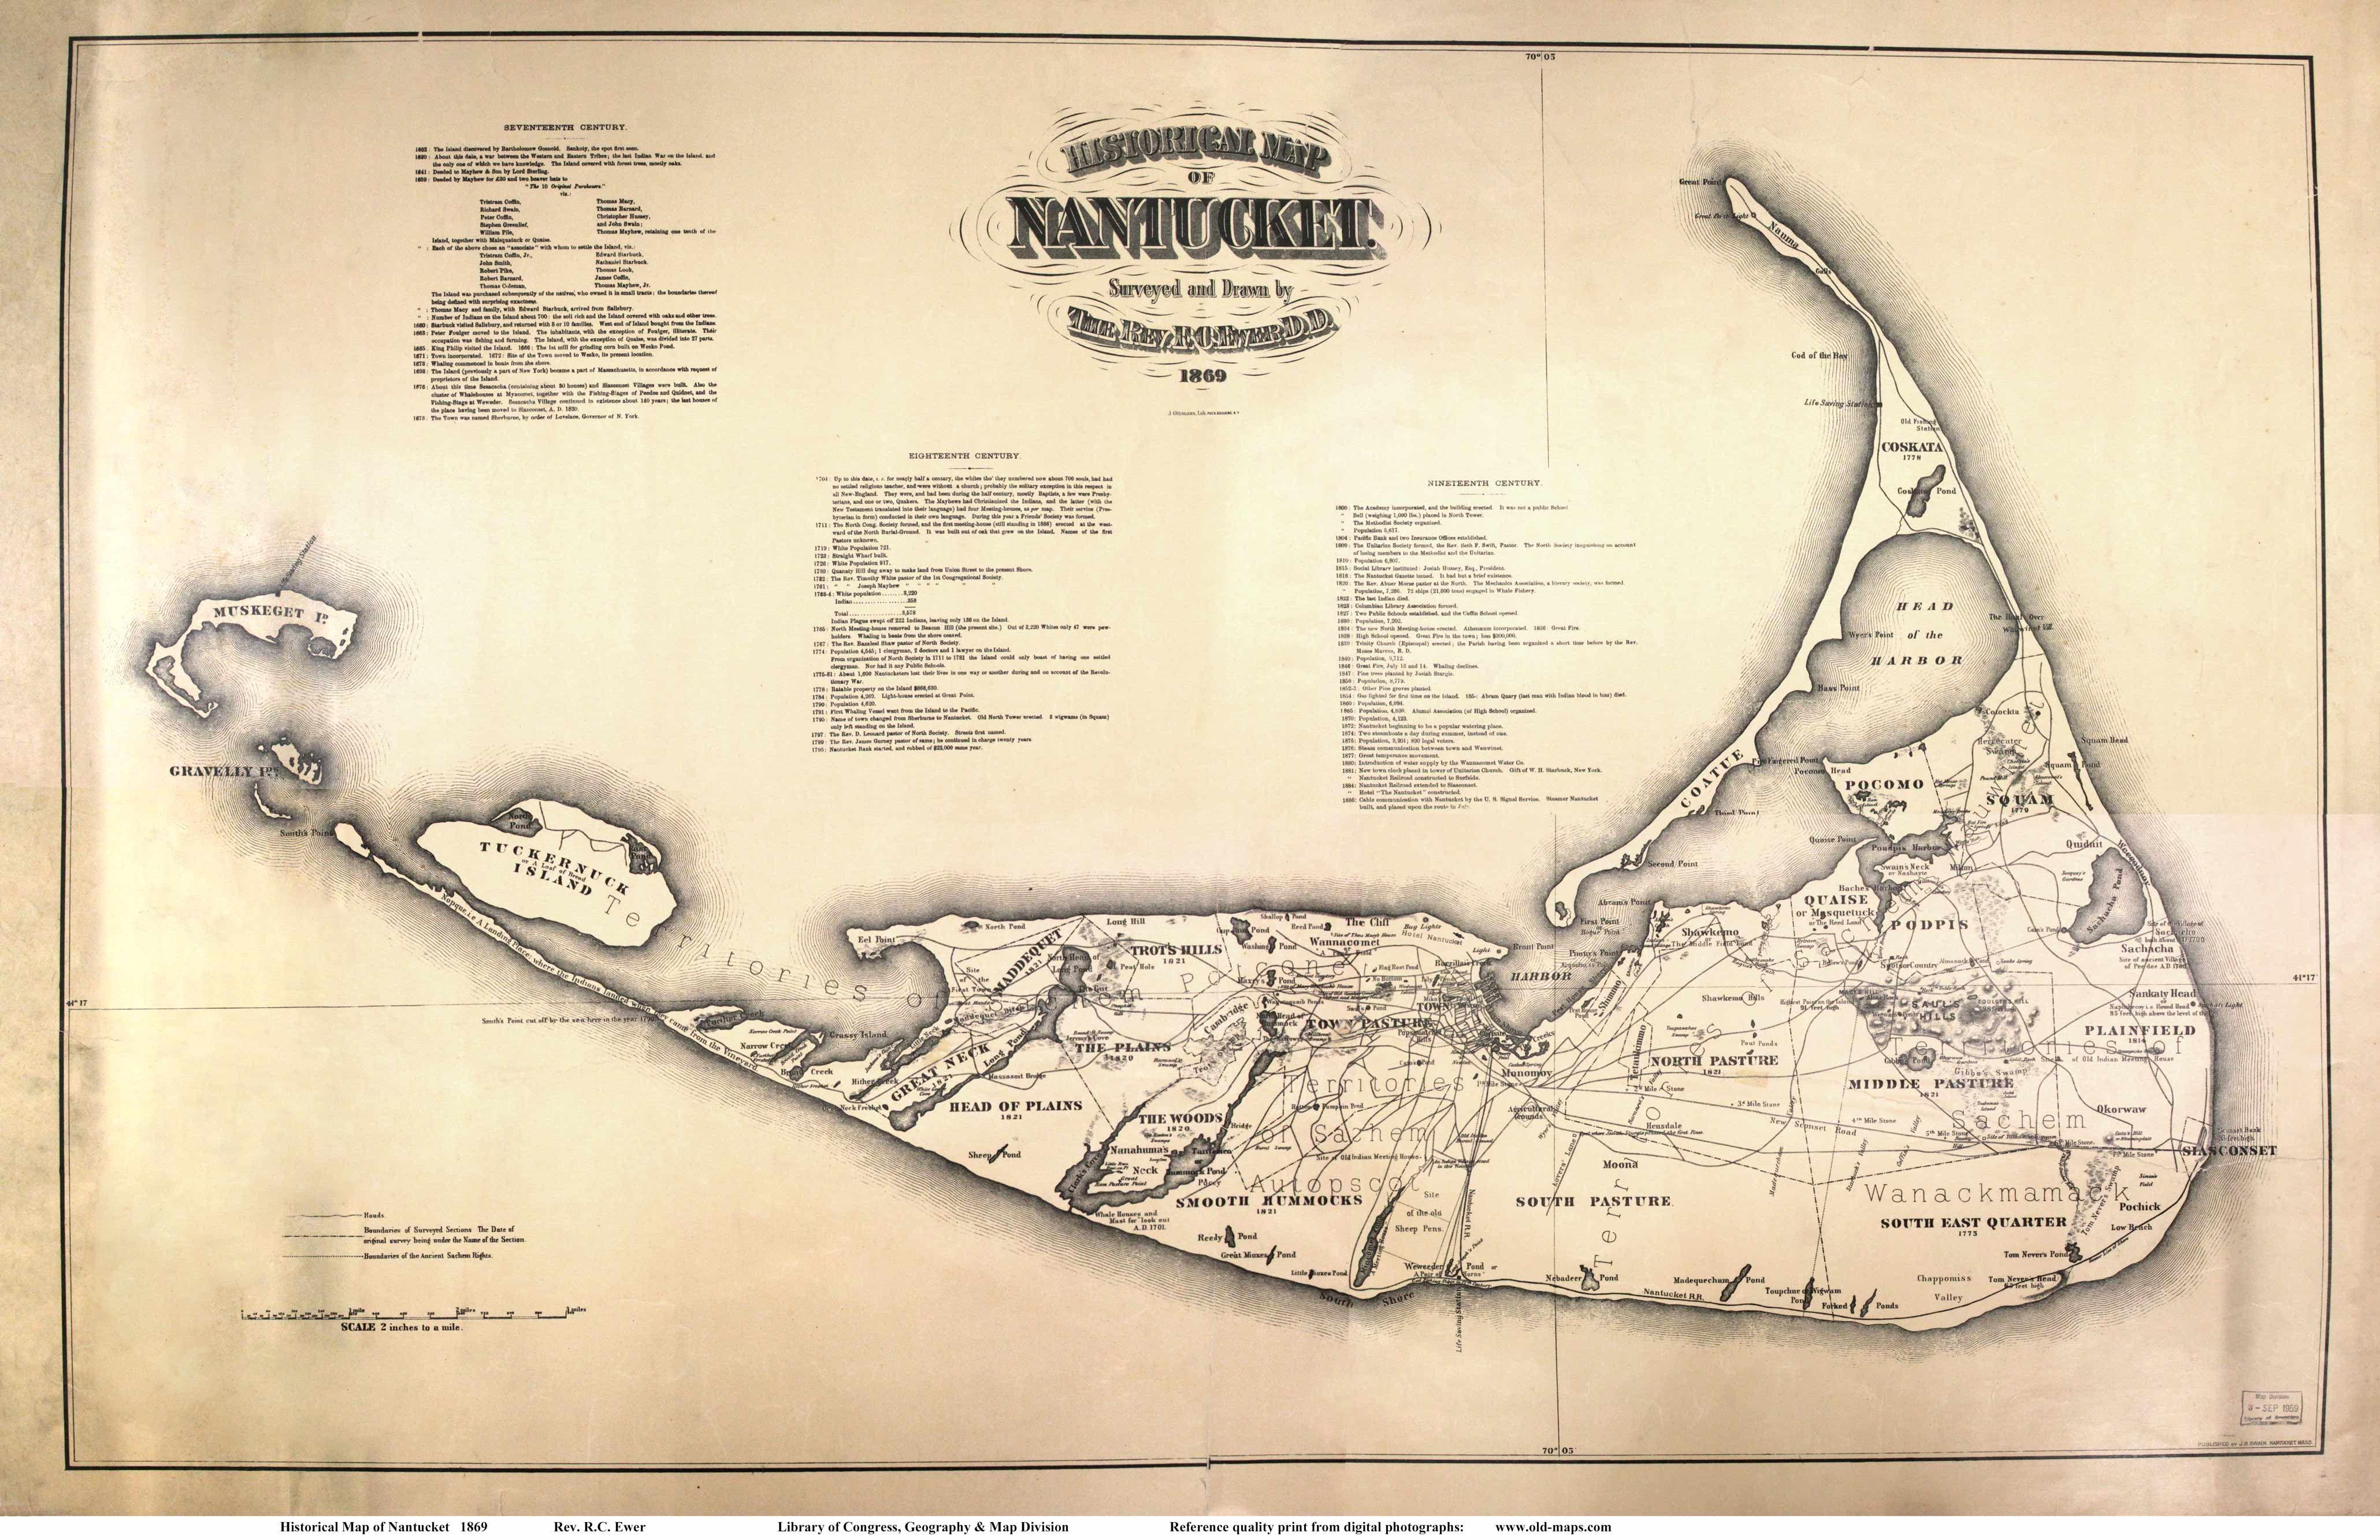 Map of Nantucket 1869 | Nantucket, Nantucket, Nantucket ... Map Geo Nantucket on charles river map, suffolk county map, billingsgate island map, cape cod map, newport map, united states map, south carolina map, martha's vineyard map, hudson ma on map, hyannis map, maine map, block island map, long island map, hawaii map, massachusetts map, boston map, connecticut shore map, north carolina map, new england map, plymouth map,